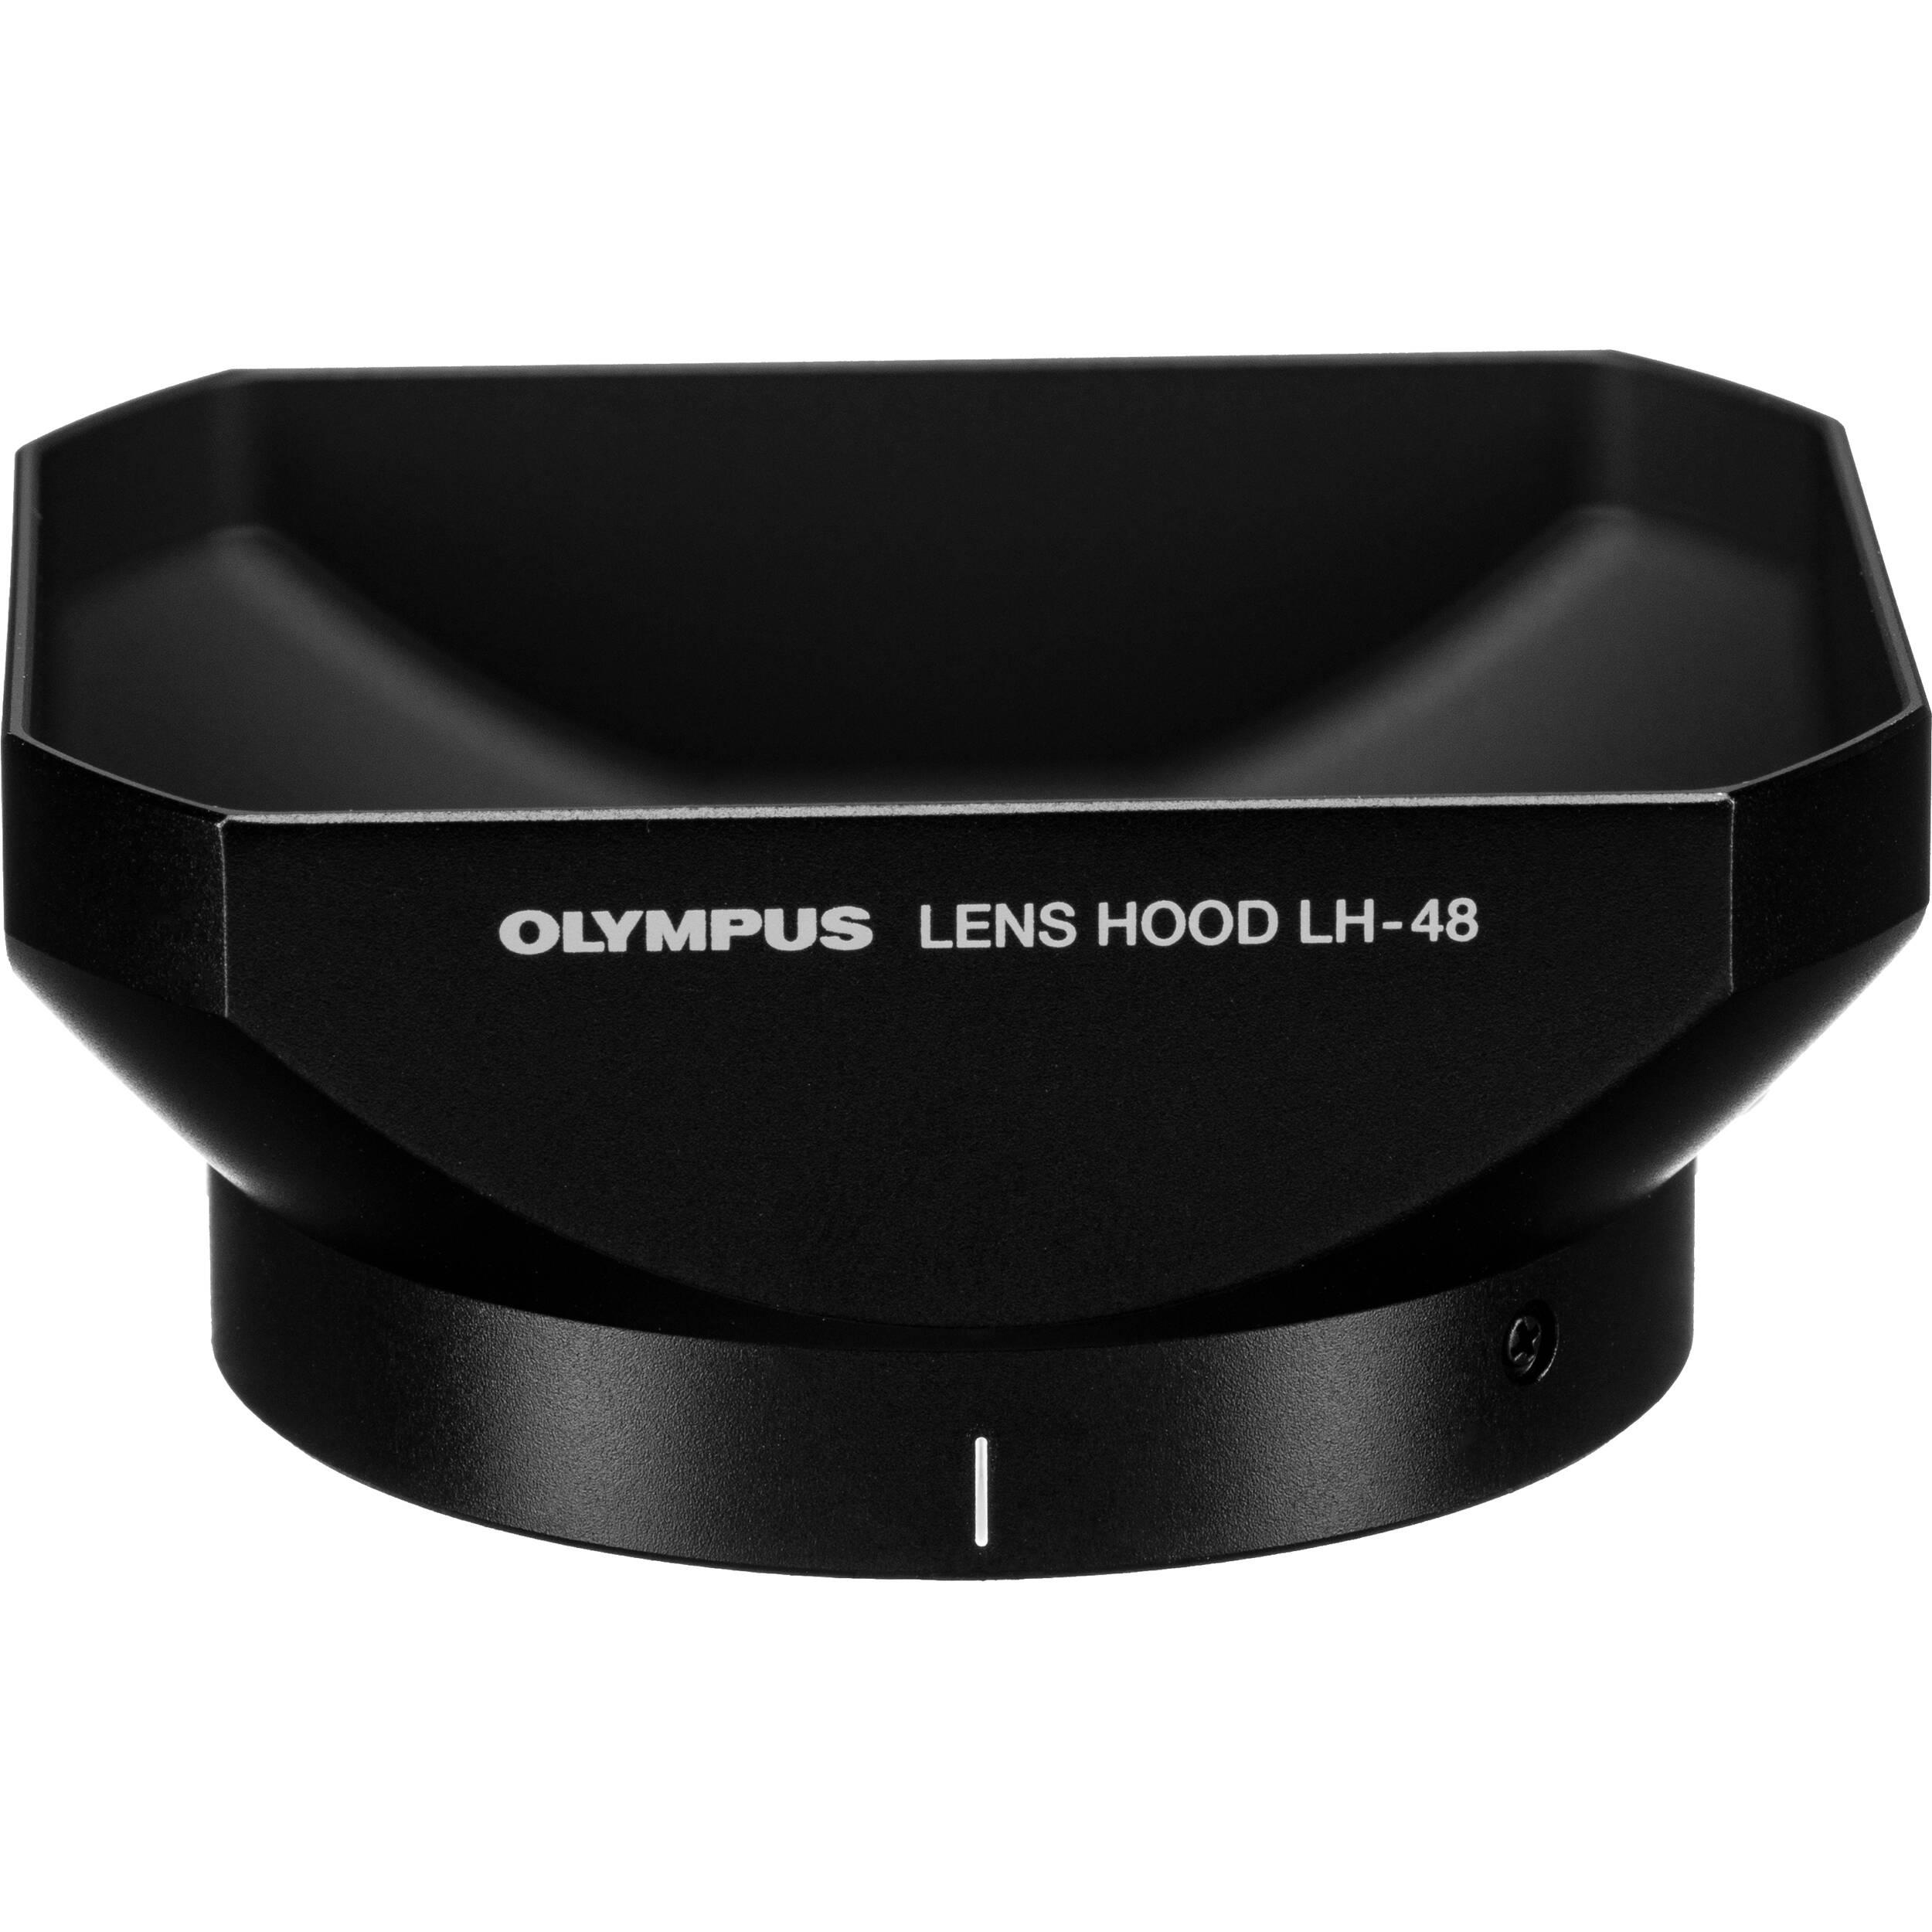 Black Olympus LH-48 Lens Hood for 12 mm f2.0 Lens